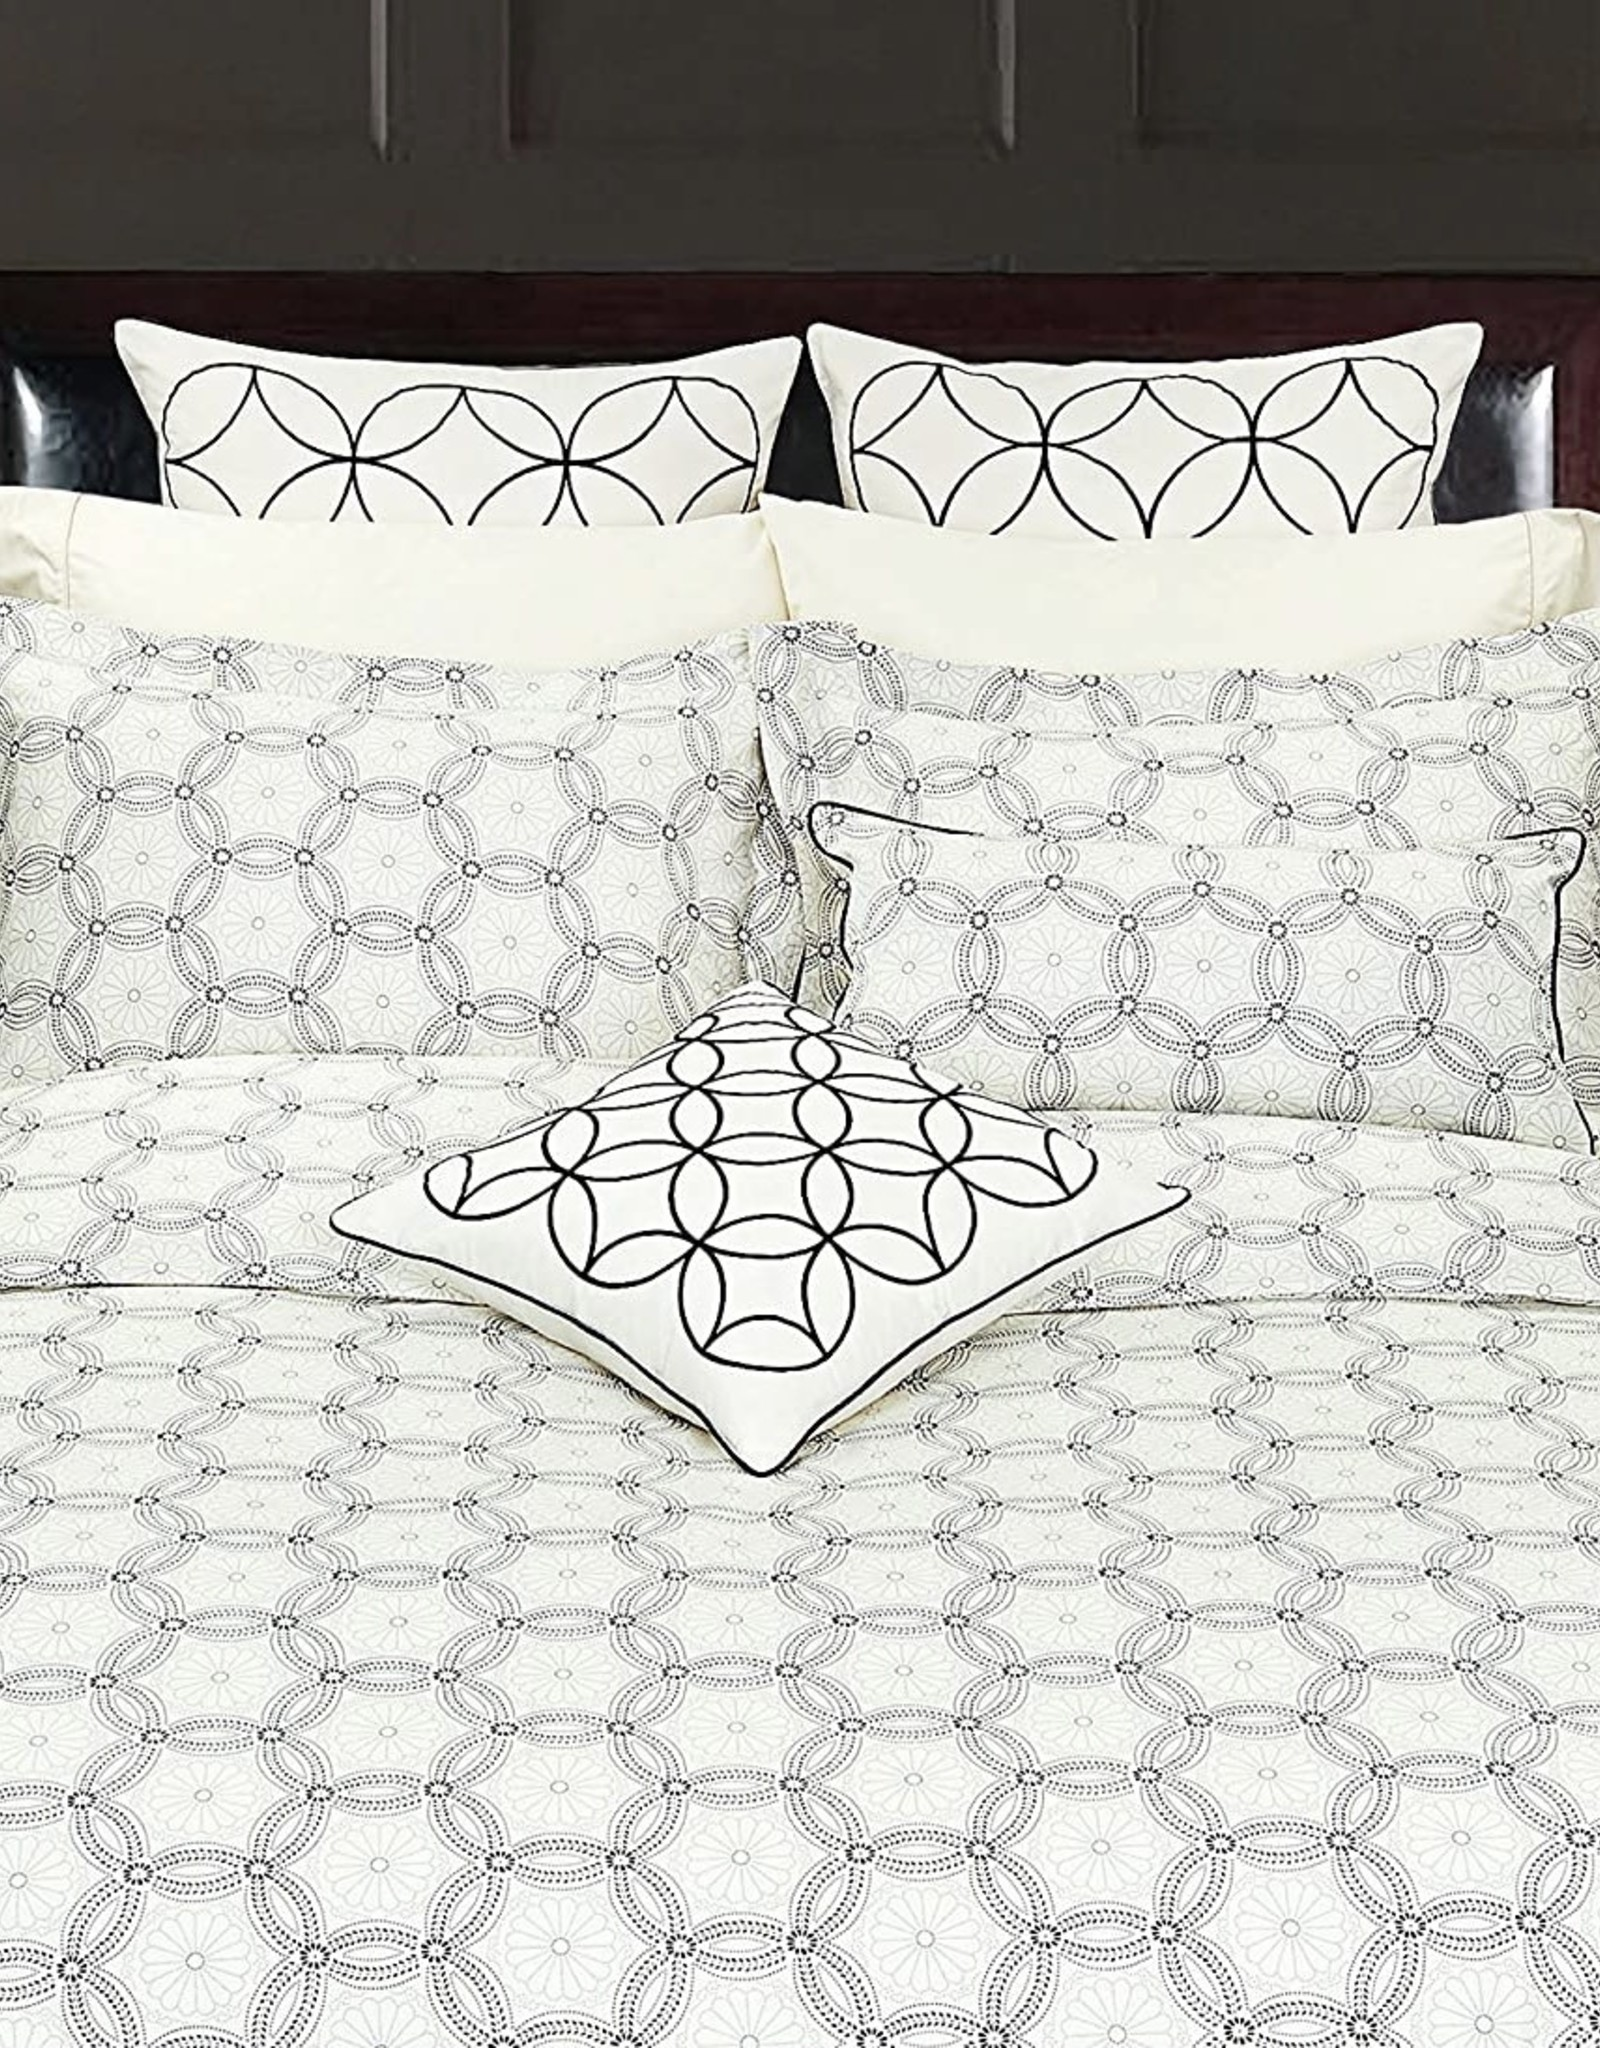 Duvet Set Highland Feather Spiral Graph Double Cover w/ Pillow Case